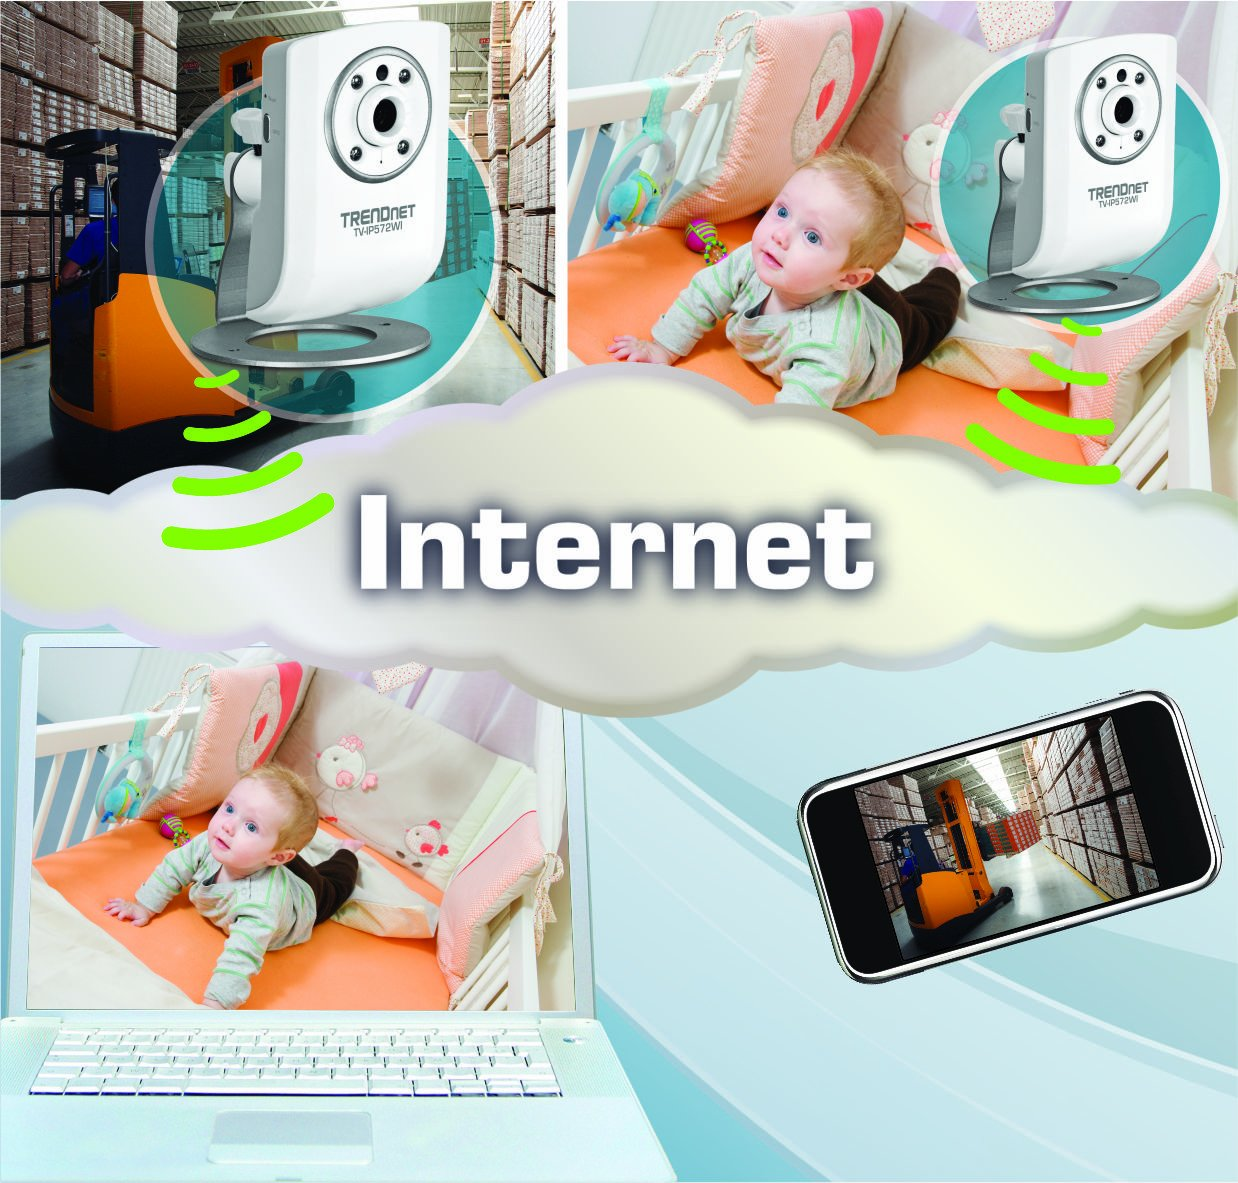 Amazon.com : TRENDnet Megapixel Wireless N Network Surveillance